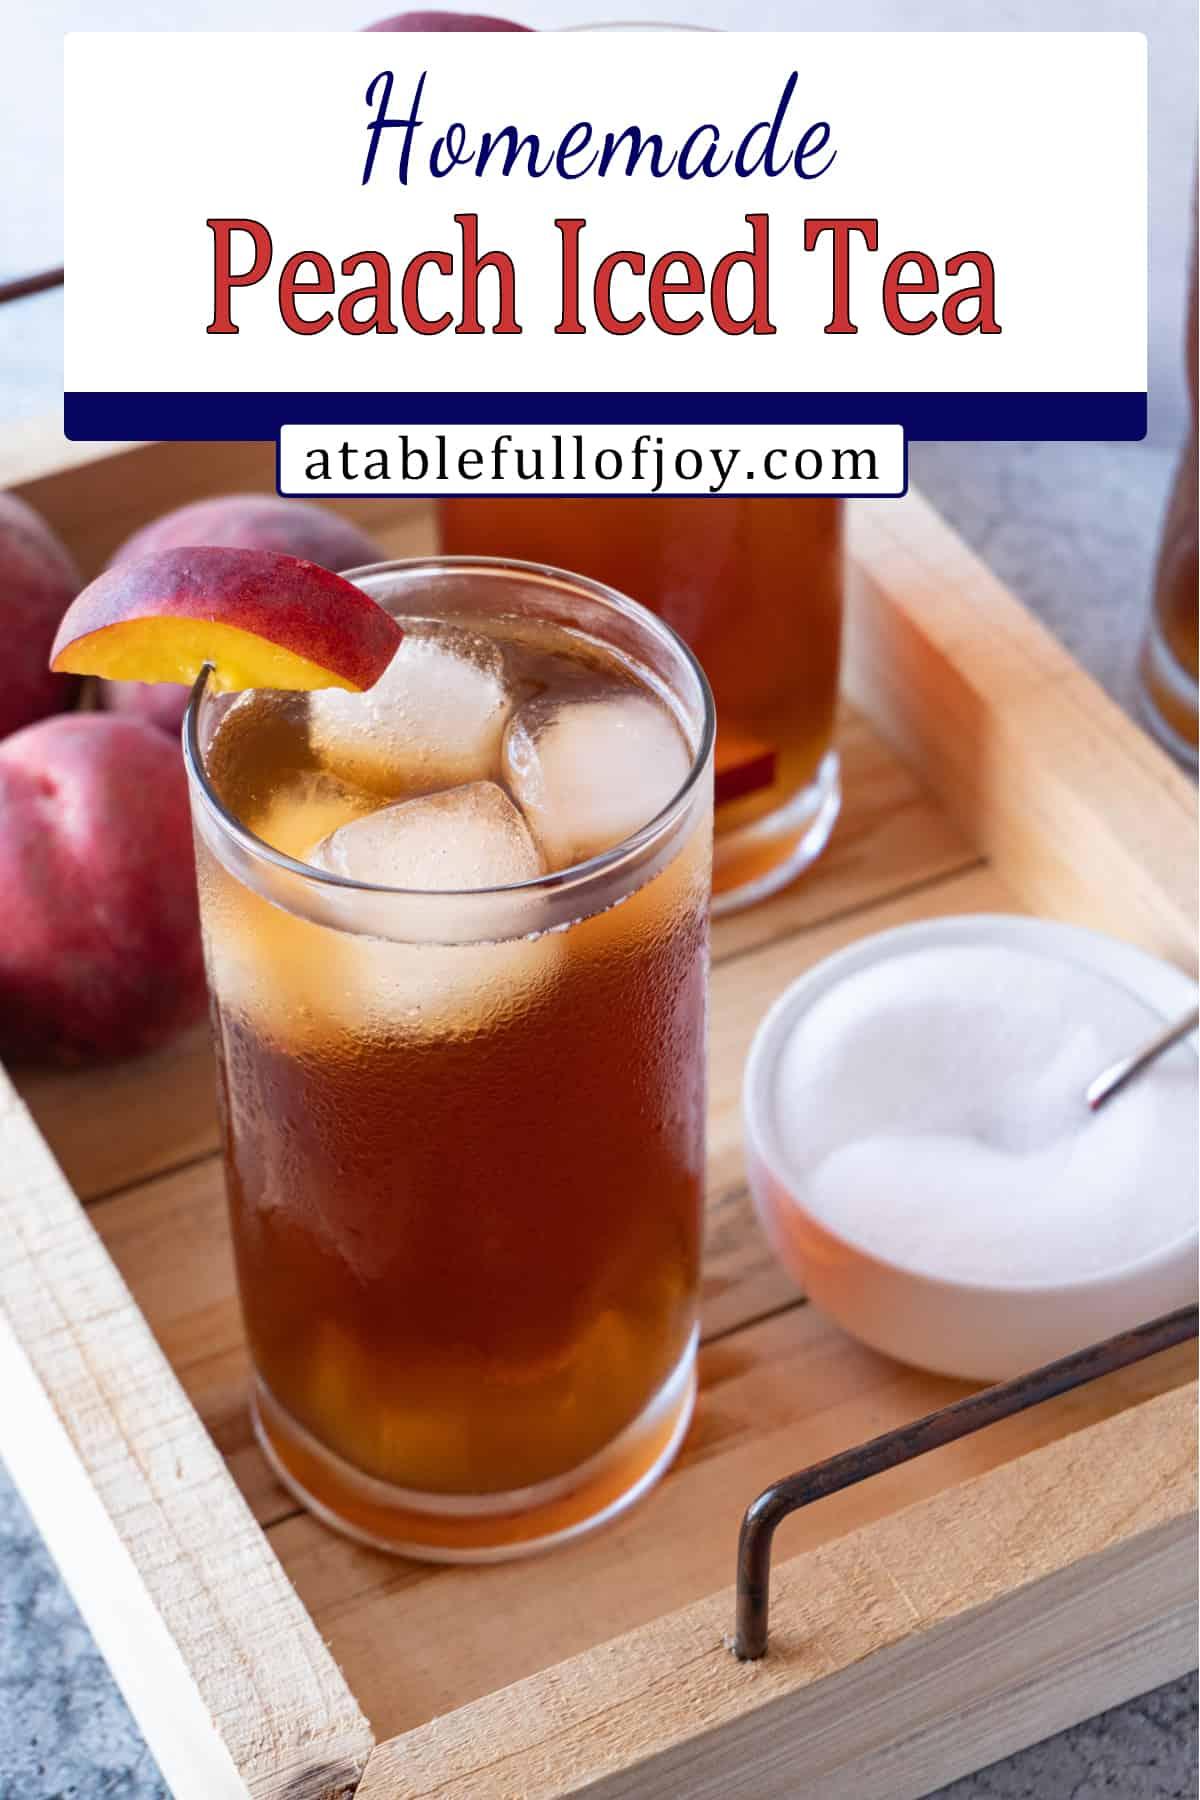 peach tea in class on wooden tray Pinterest pin